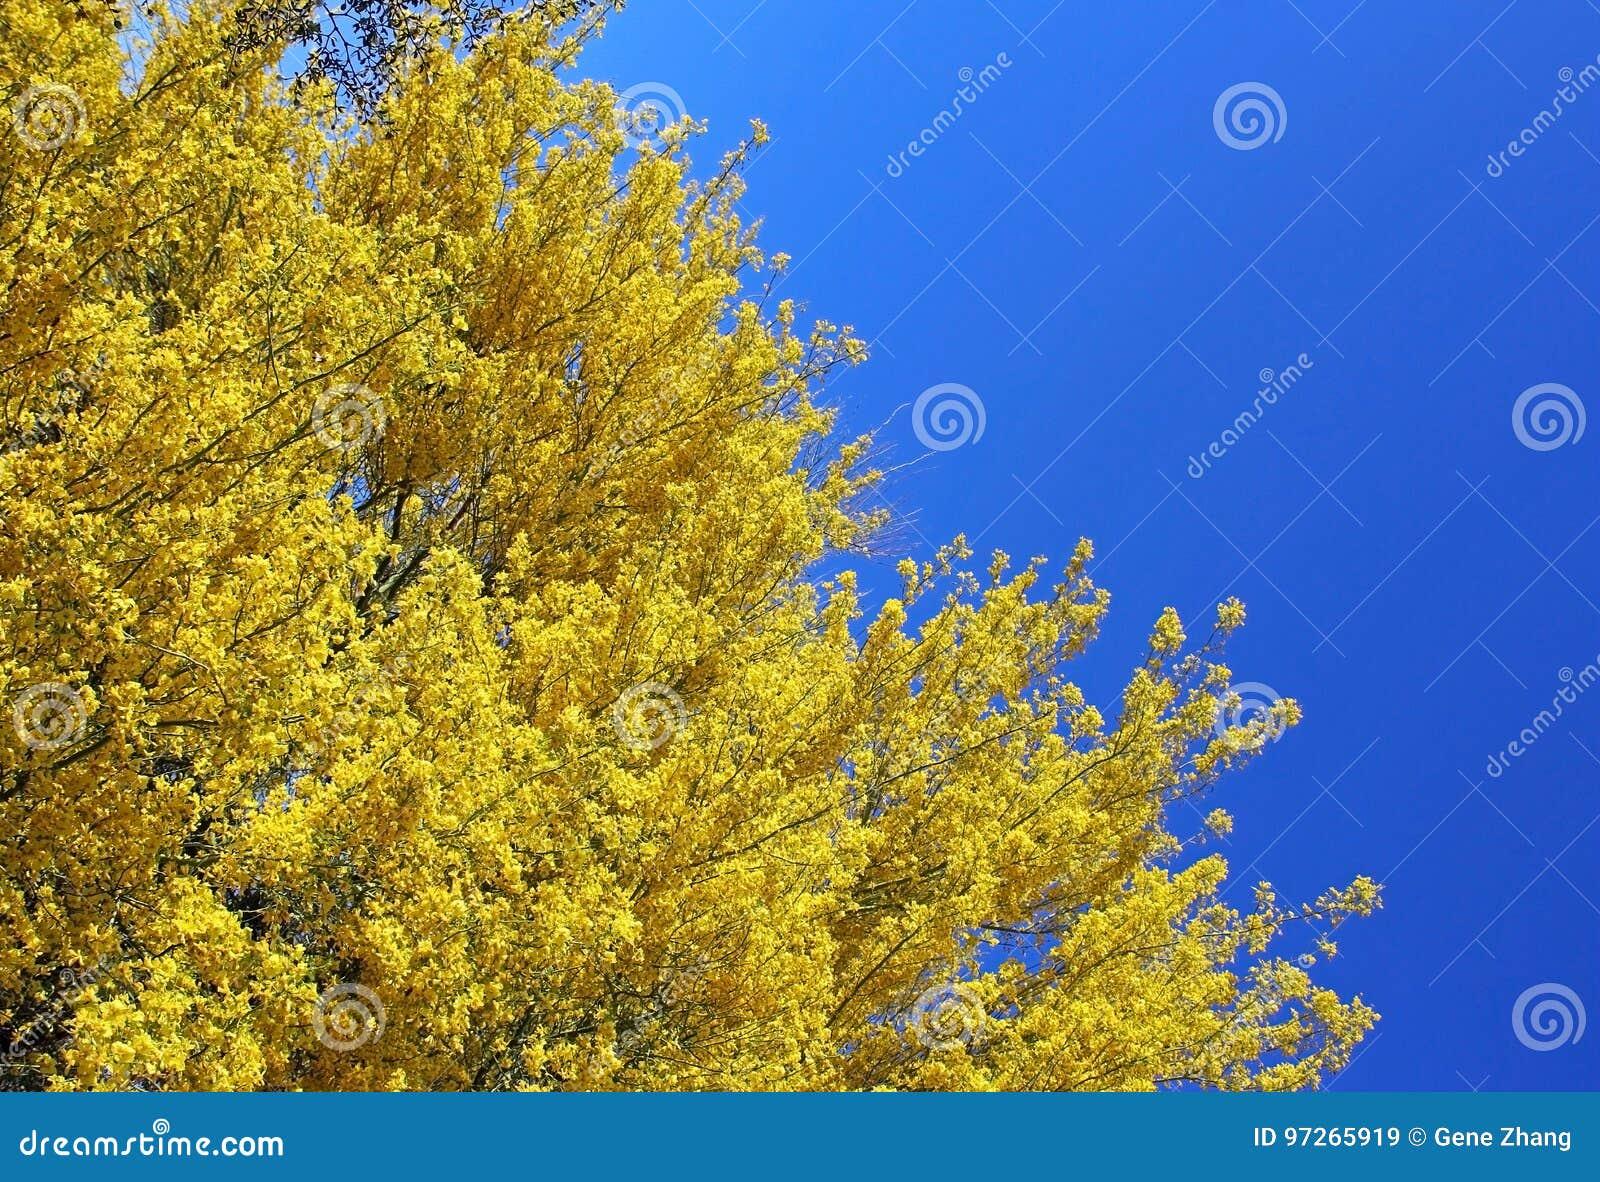 Palo Verde Arizona State Tree Stock Image Image Of Flowers